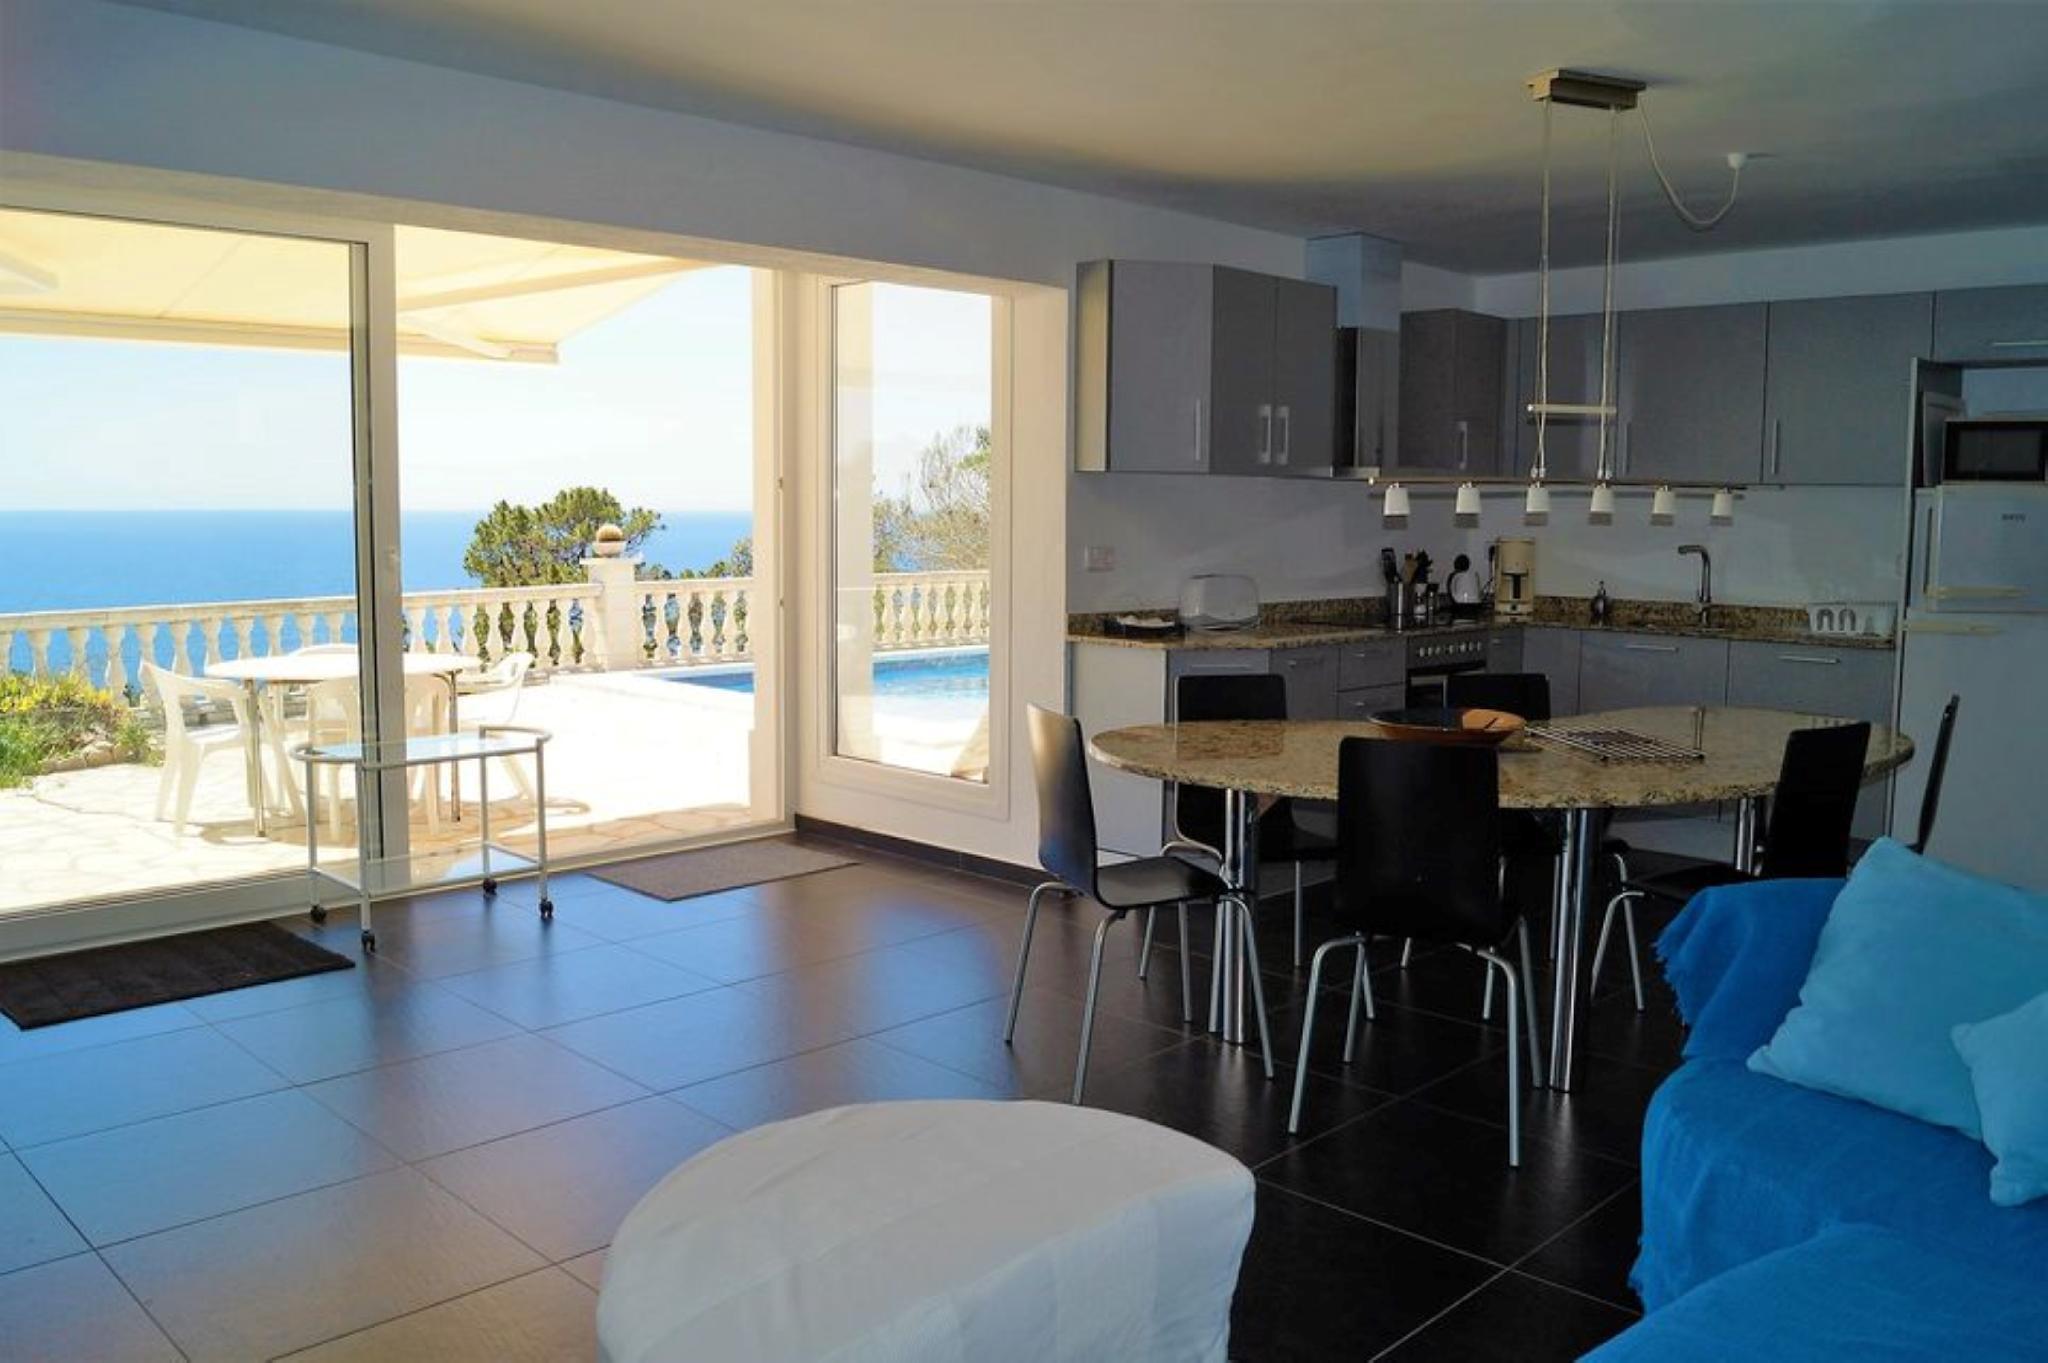 107516   House In Lloret De Mar